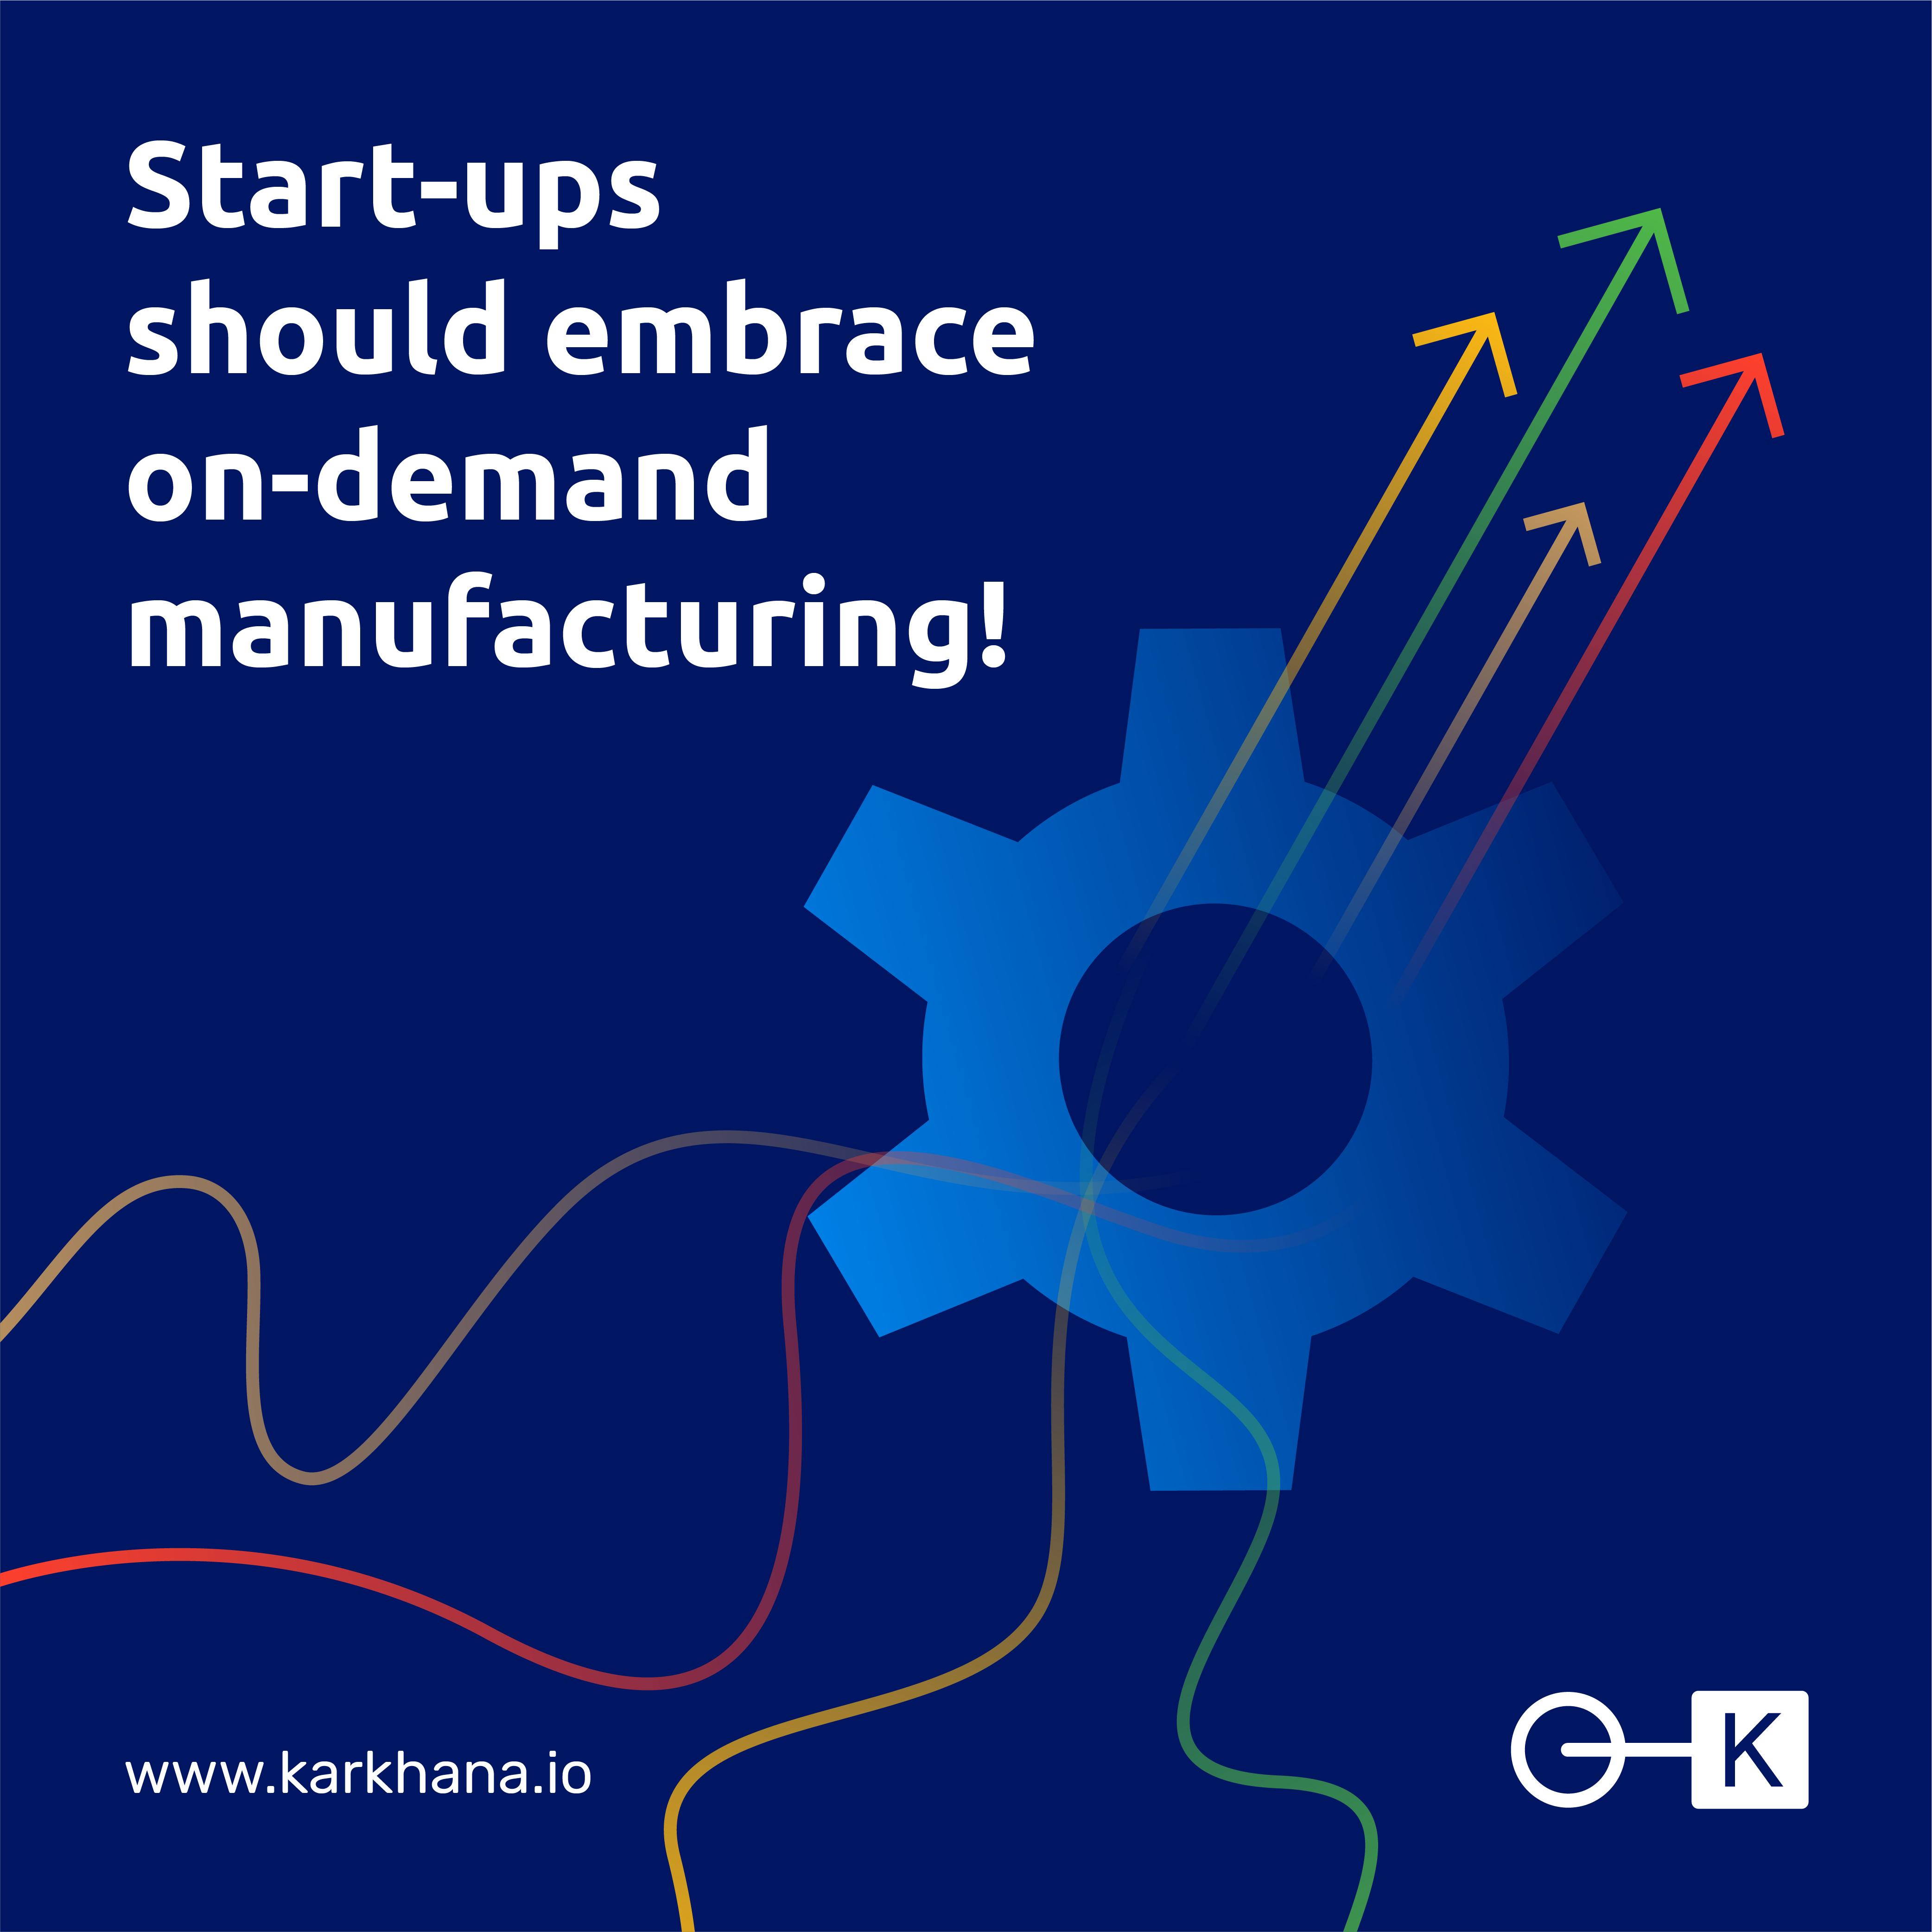 Start-ups should embrace on-demand manufacturing